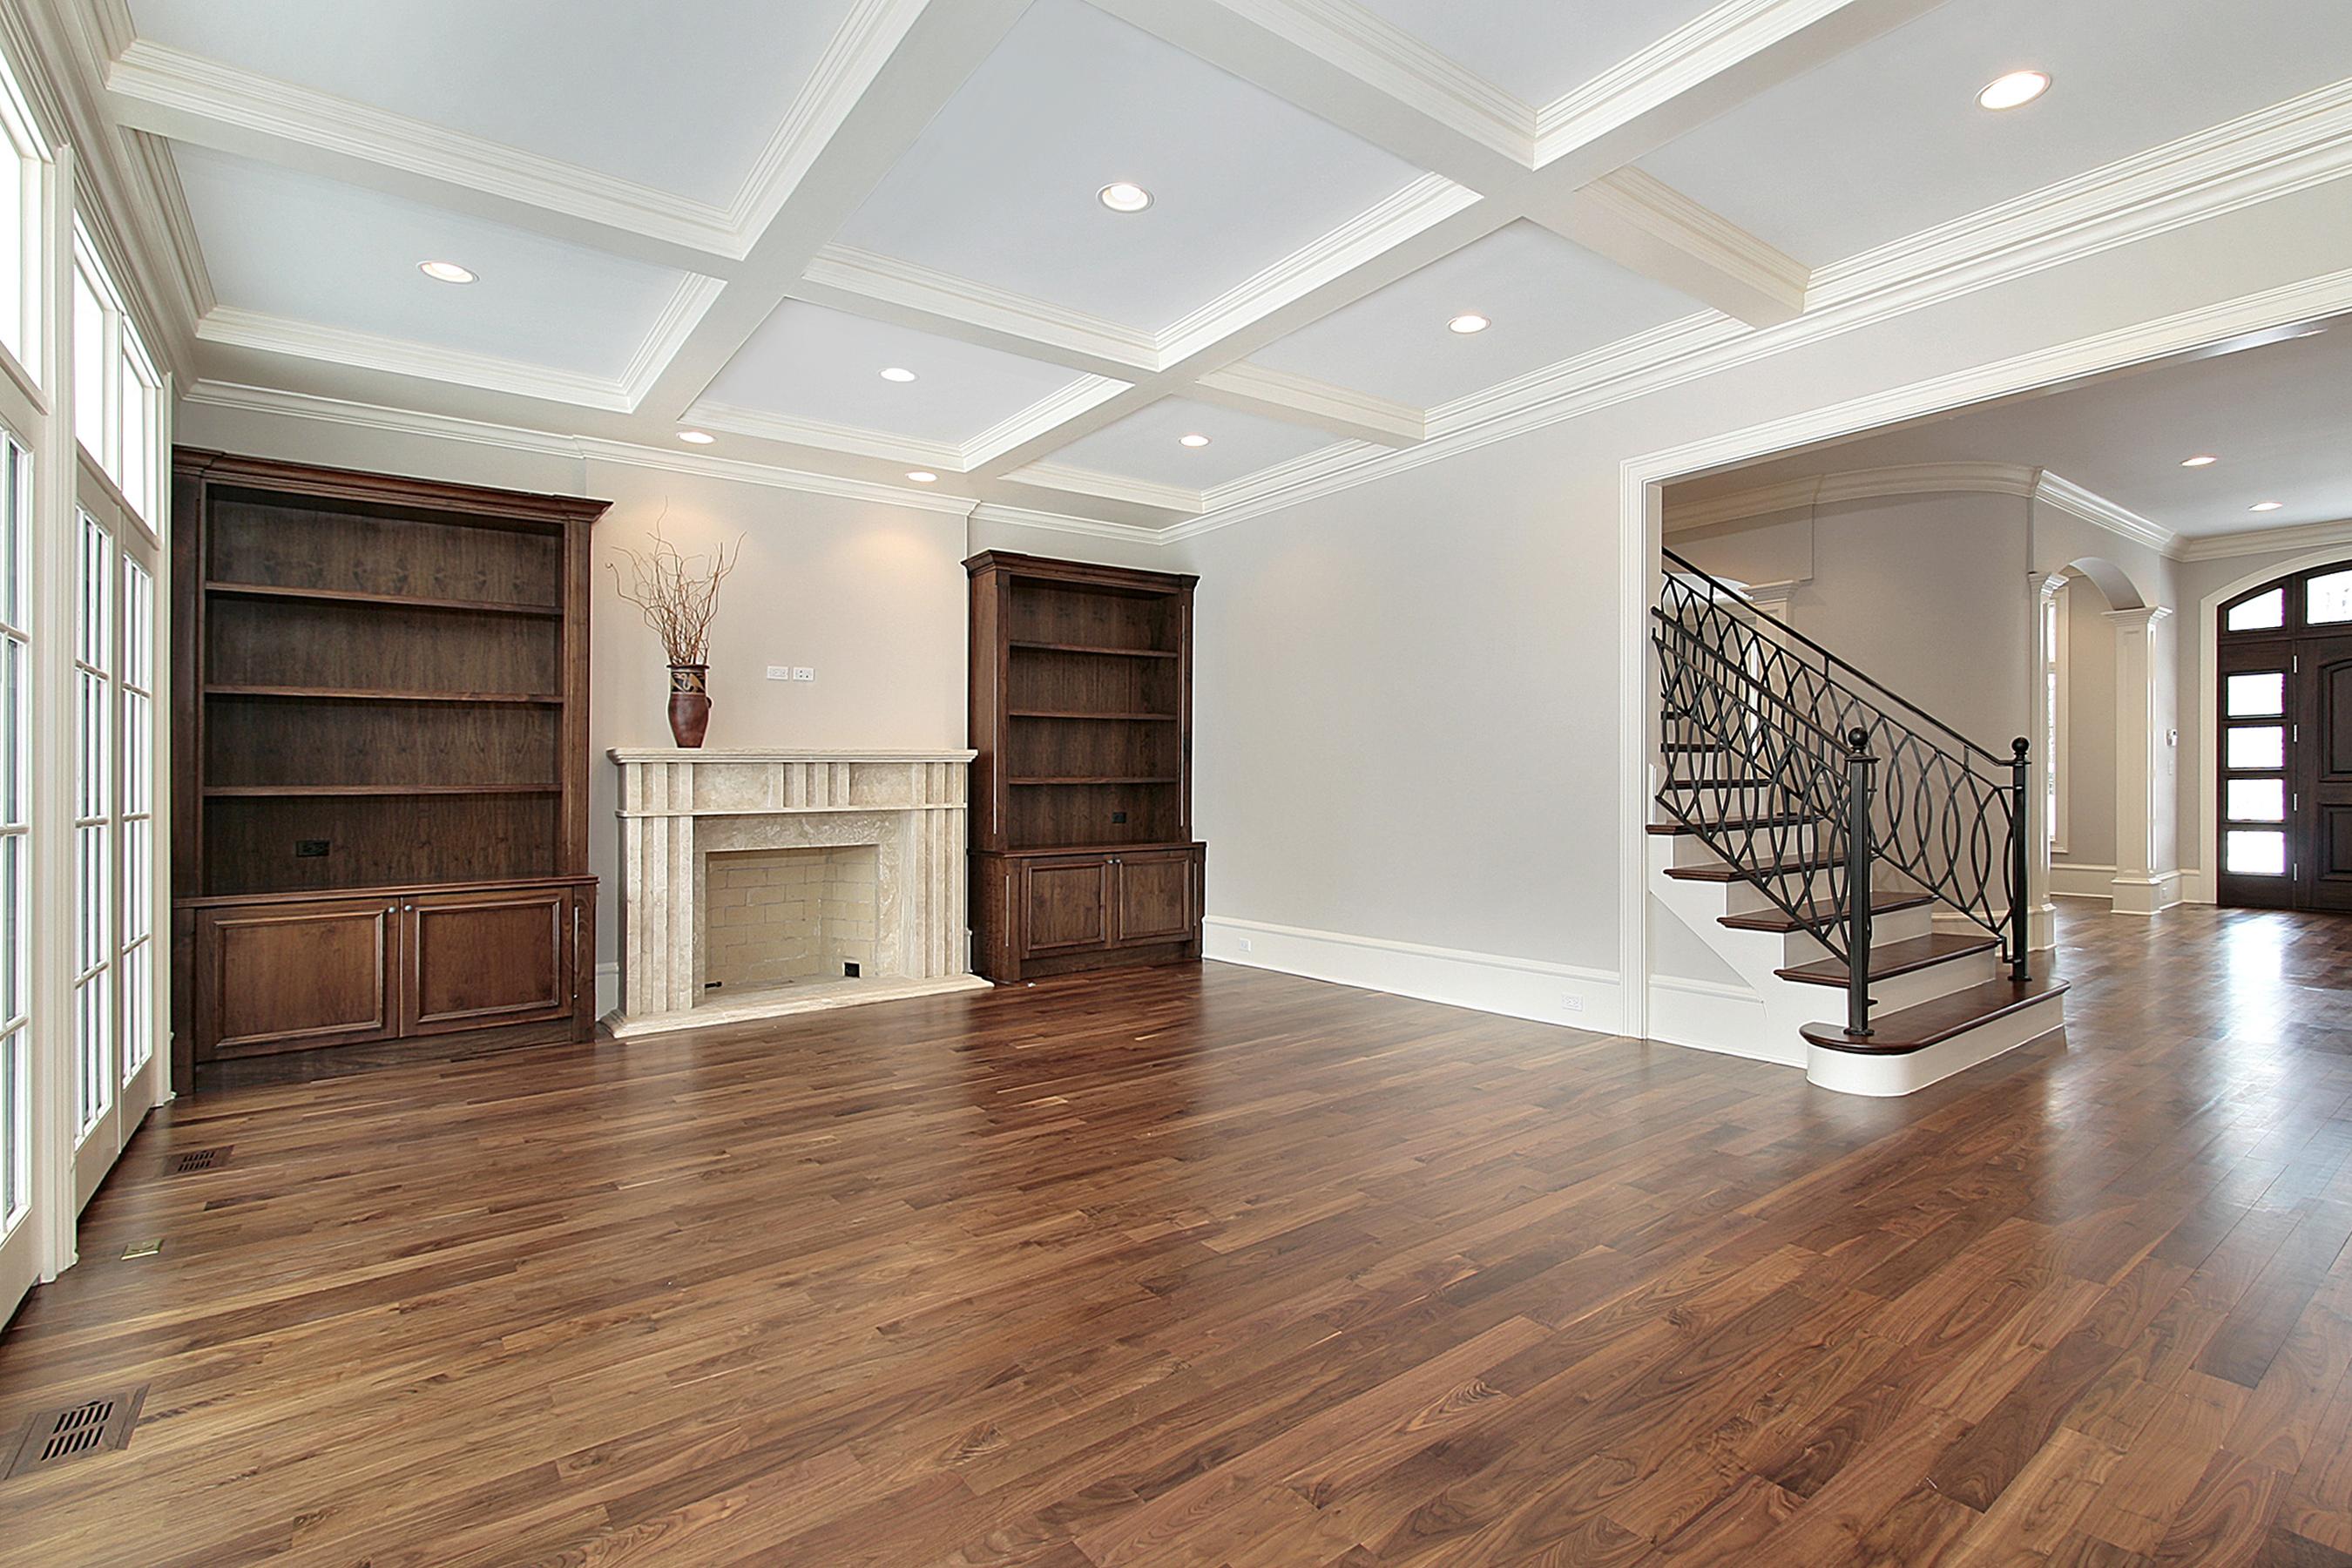 bigstock-Family-Room-In-New-Constructio-5231856